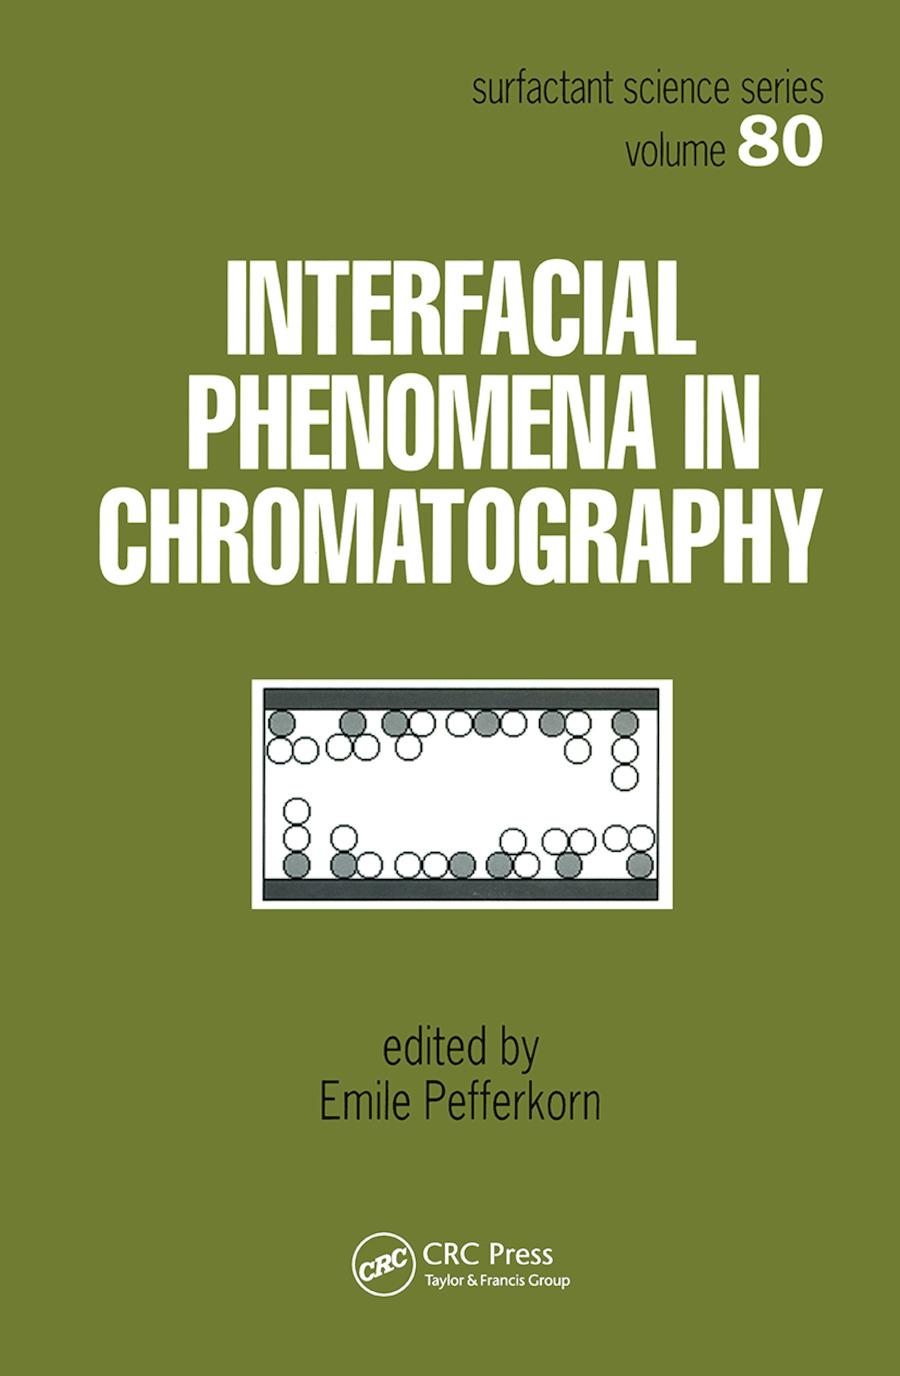 Interfacial Phenomena In Chromatography book cover